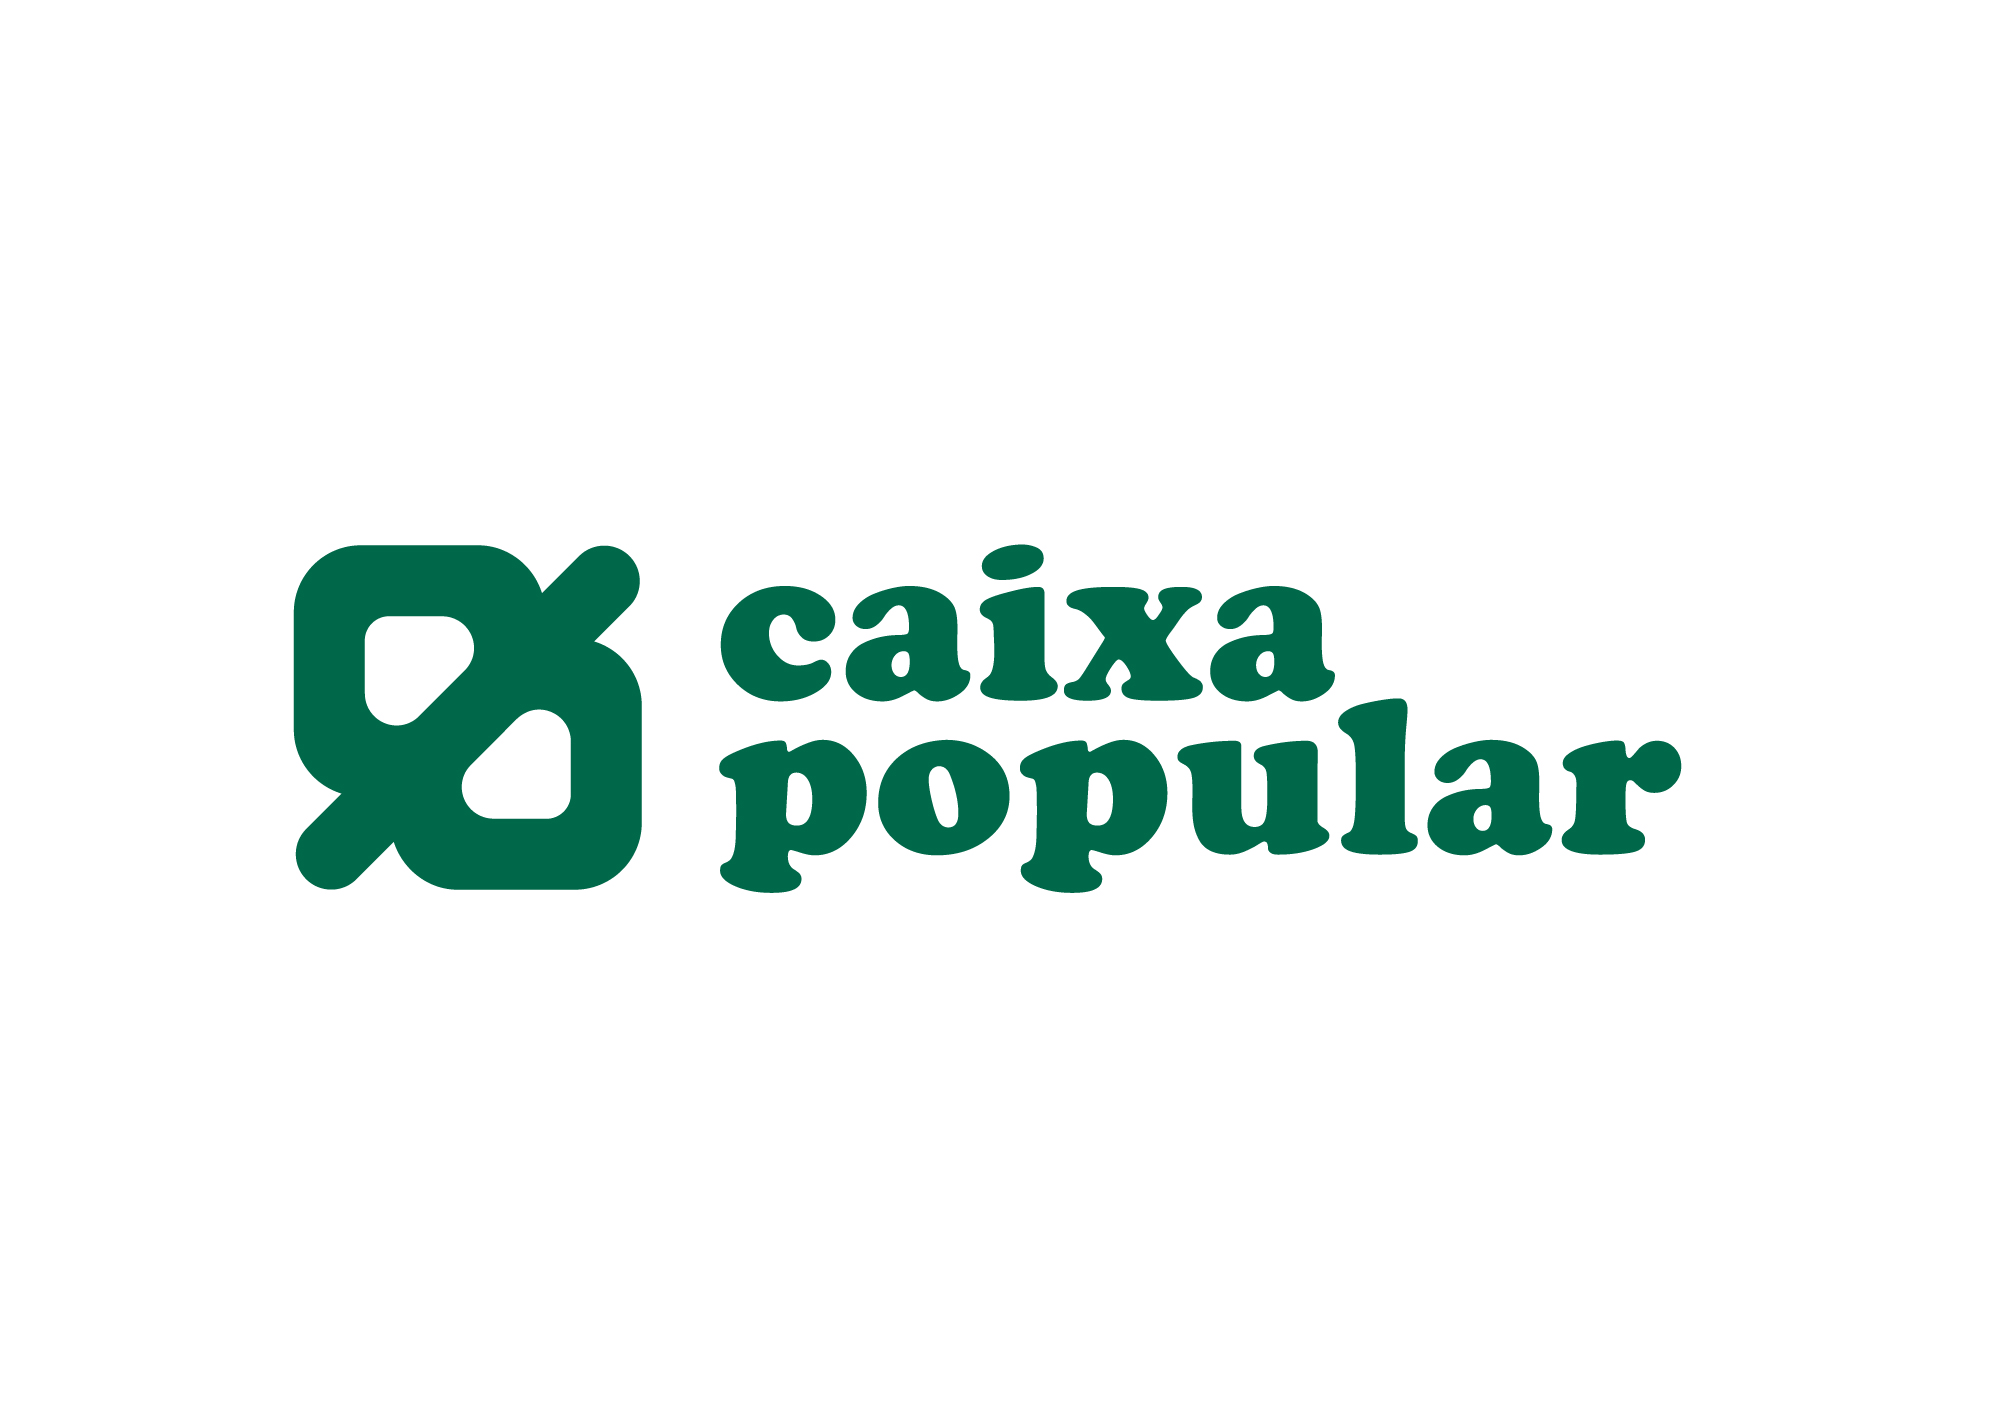 CAIXA POPULAR logo 1 - Caixa Popular